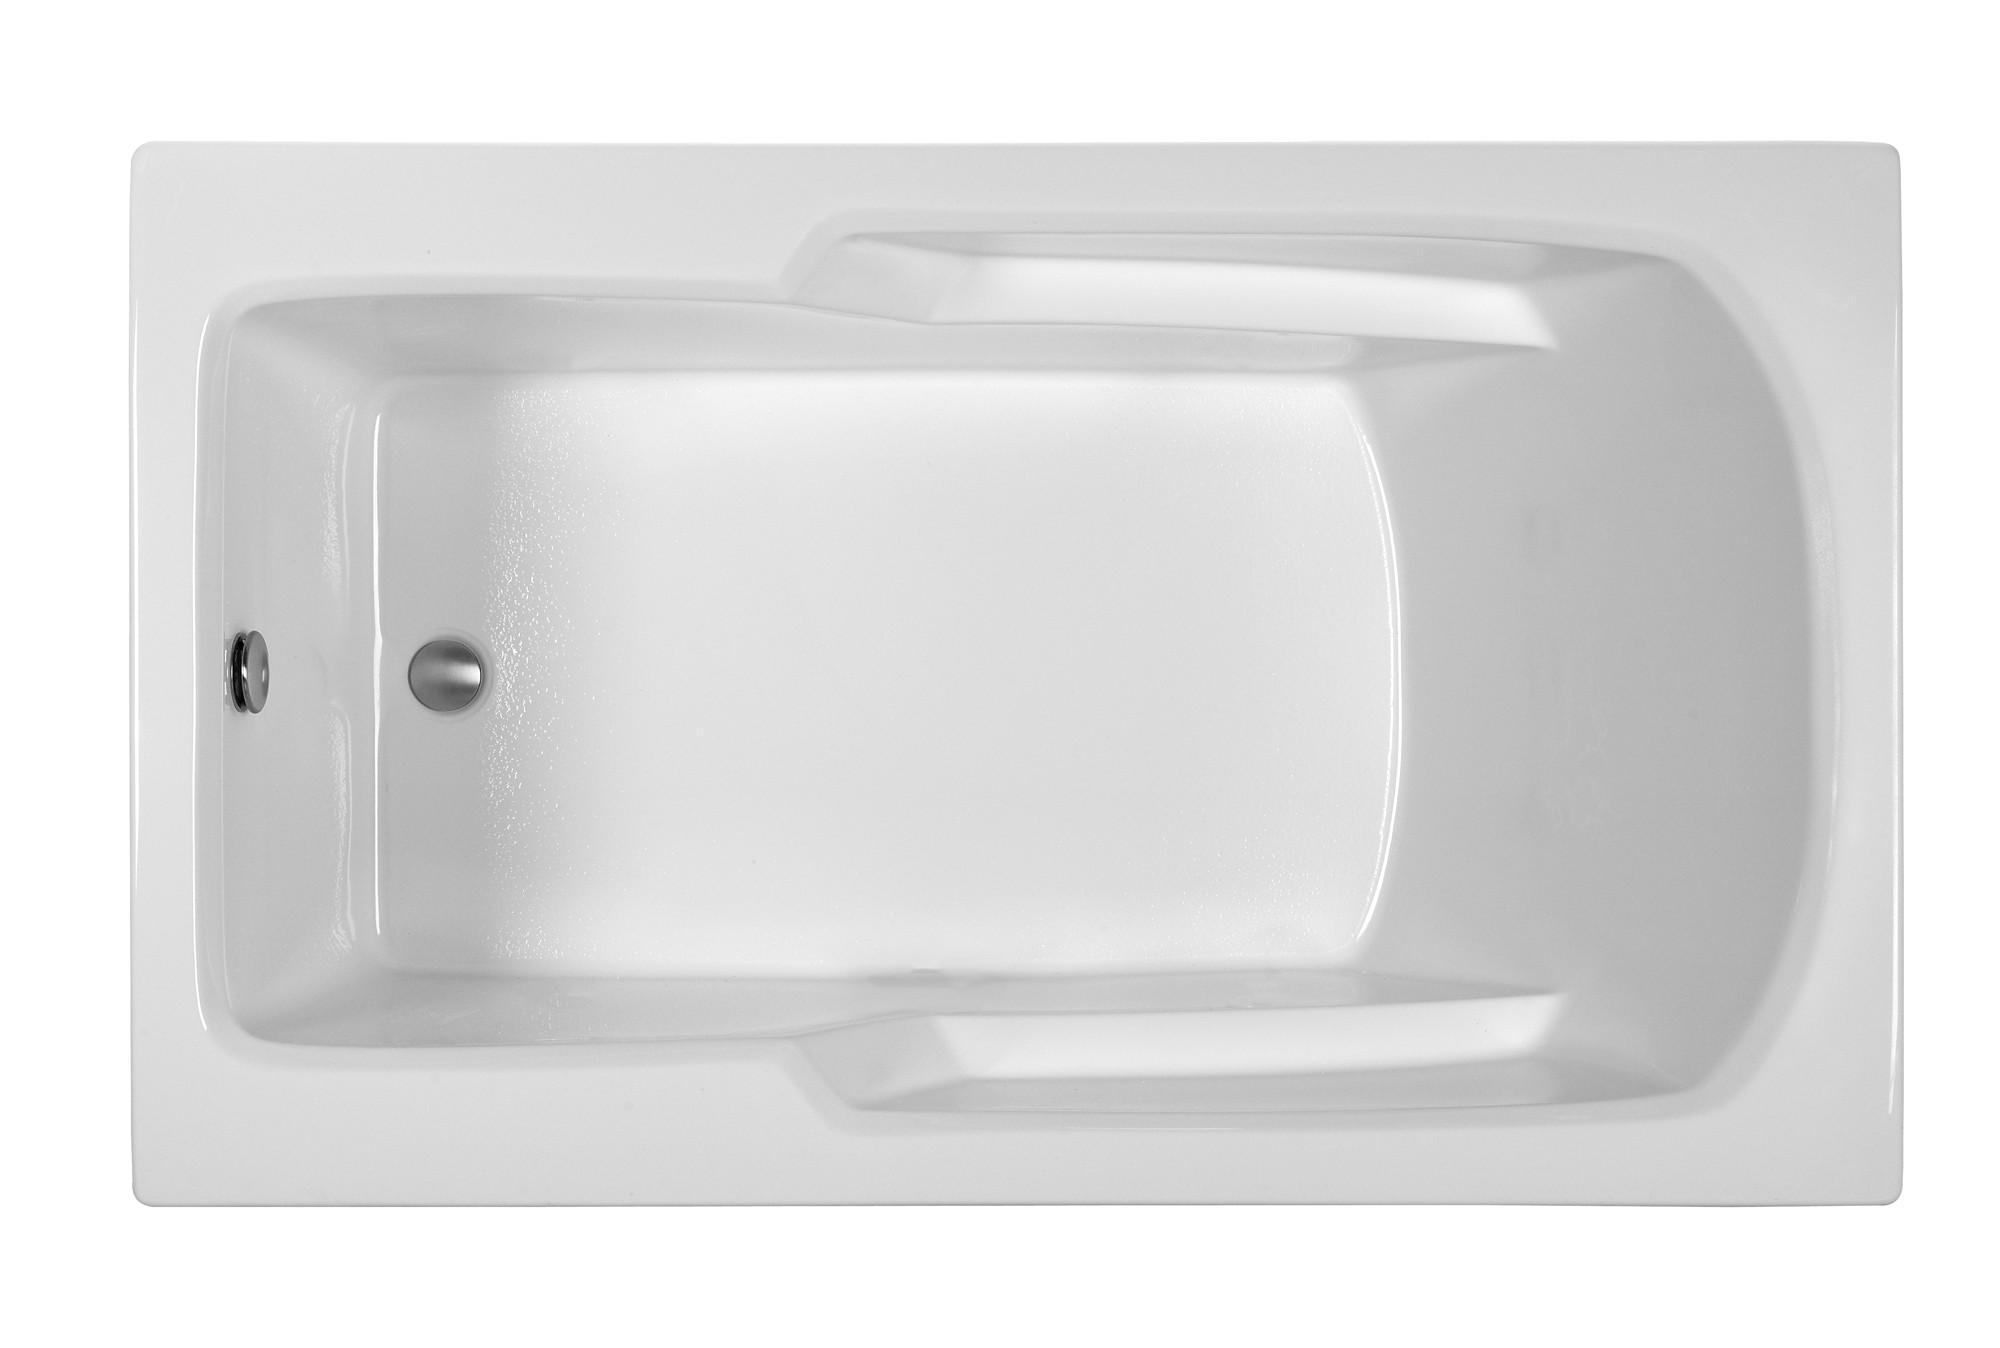 Reliance R6036ERRW 59.75 Inch Rectangular End Drain Whirlpool Bath